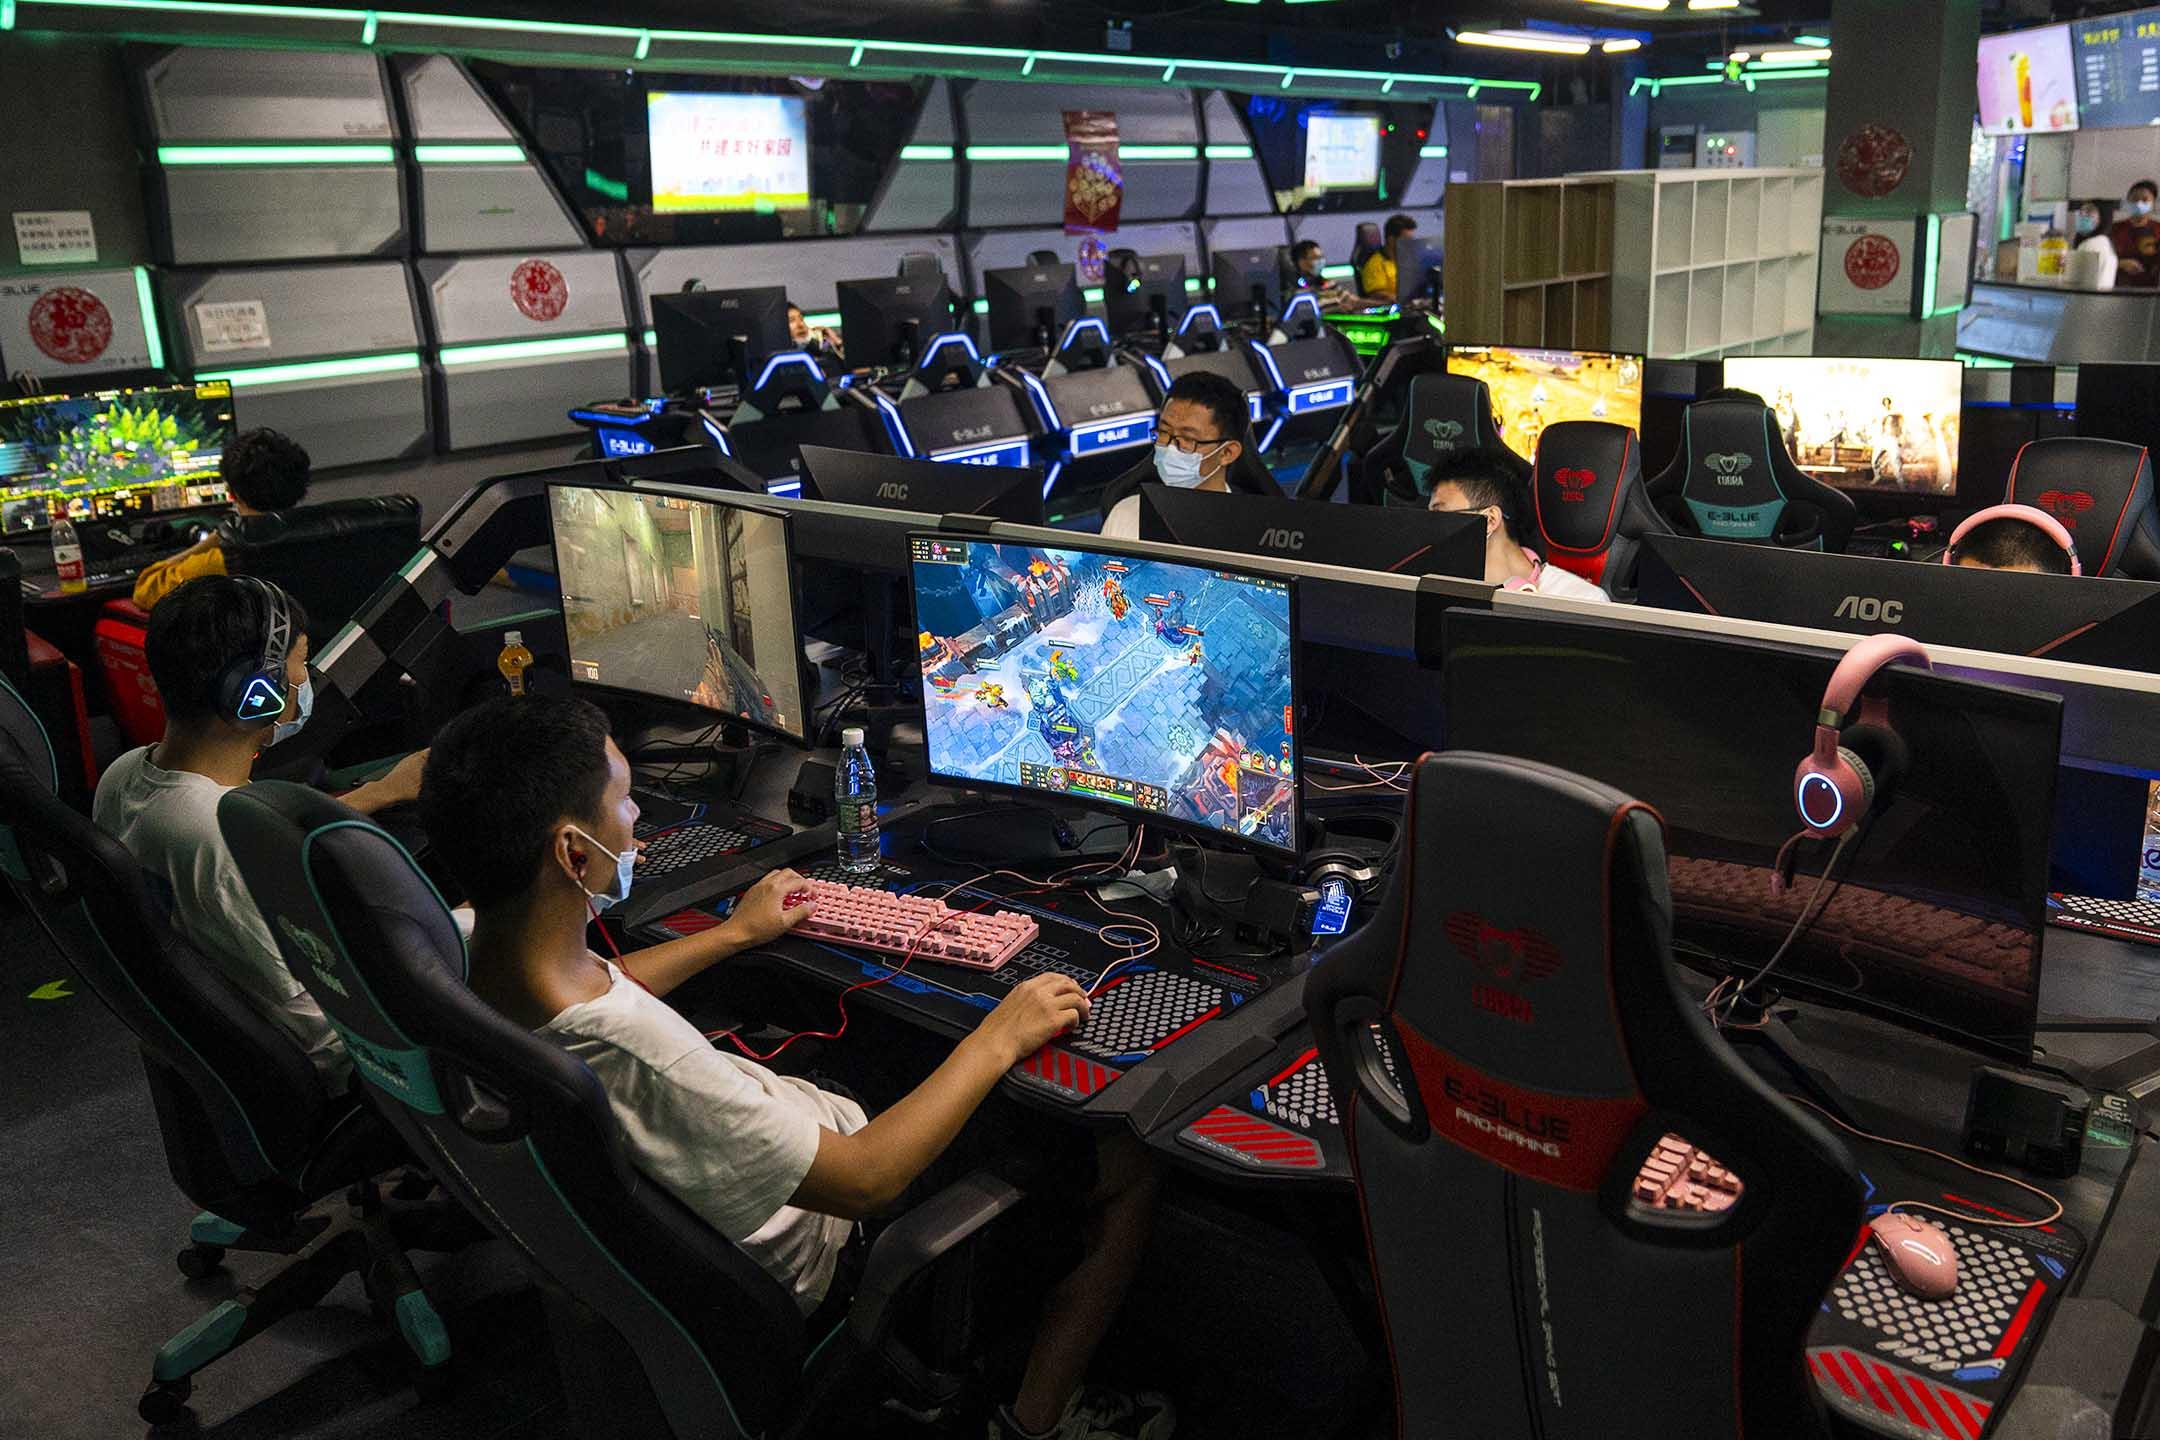 2021年9月11日中國北京,人們在玩線上遊戲。 攝:Andrea Verdelli/Getty Images